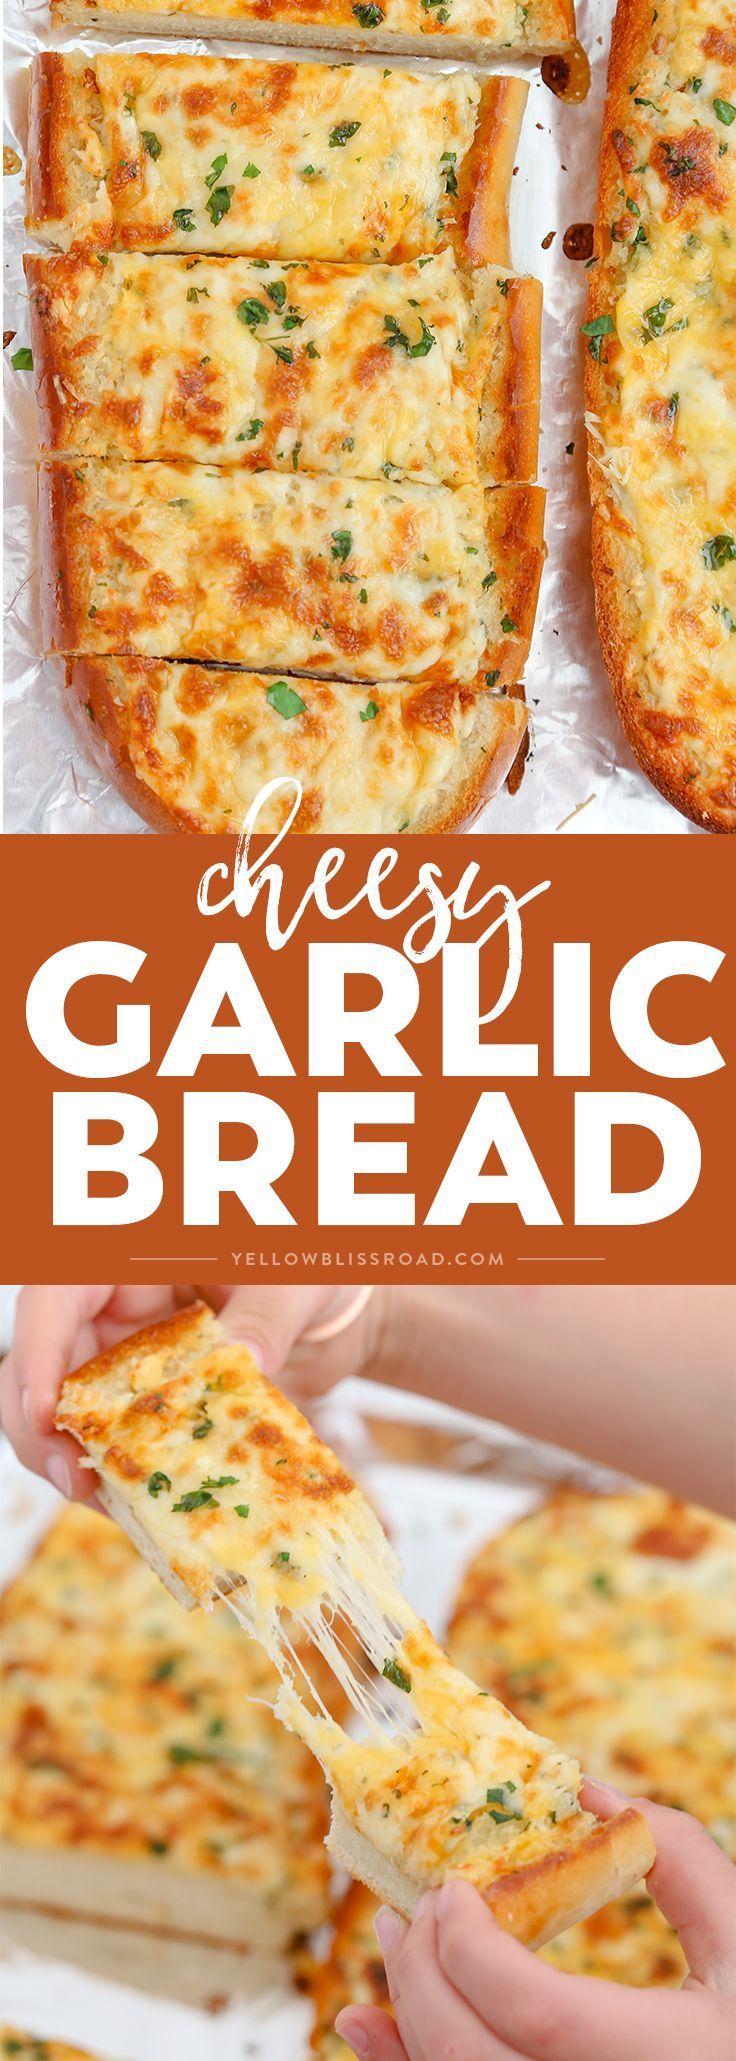 Cheesy Garlic Bread The Best Homemade Garlic Bread Recipe Recipe Homemade Garlic Bread Homemade Garlic Bread Recipe Recipes